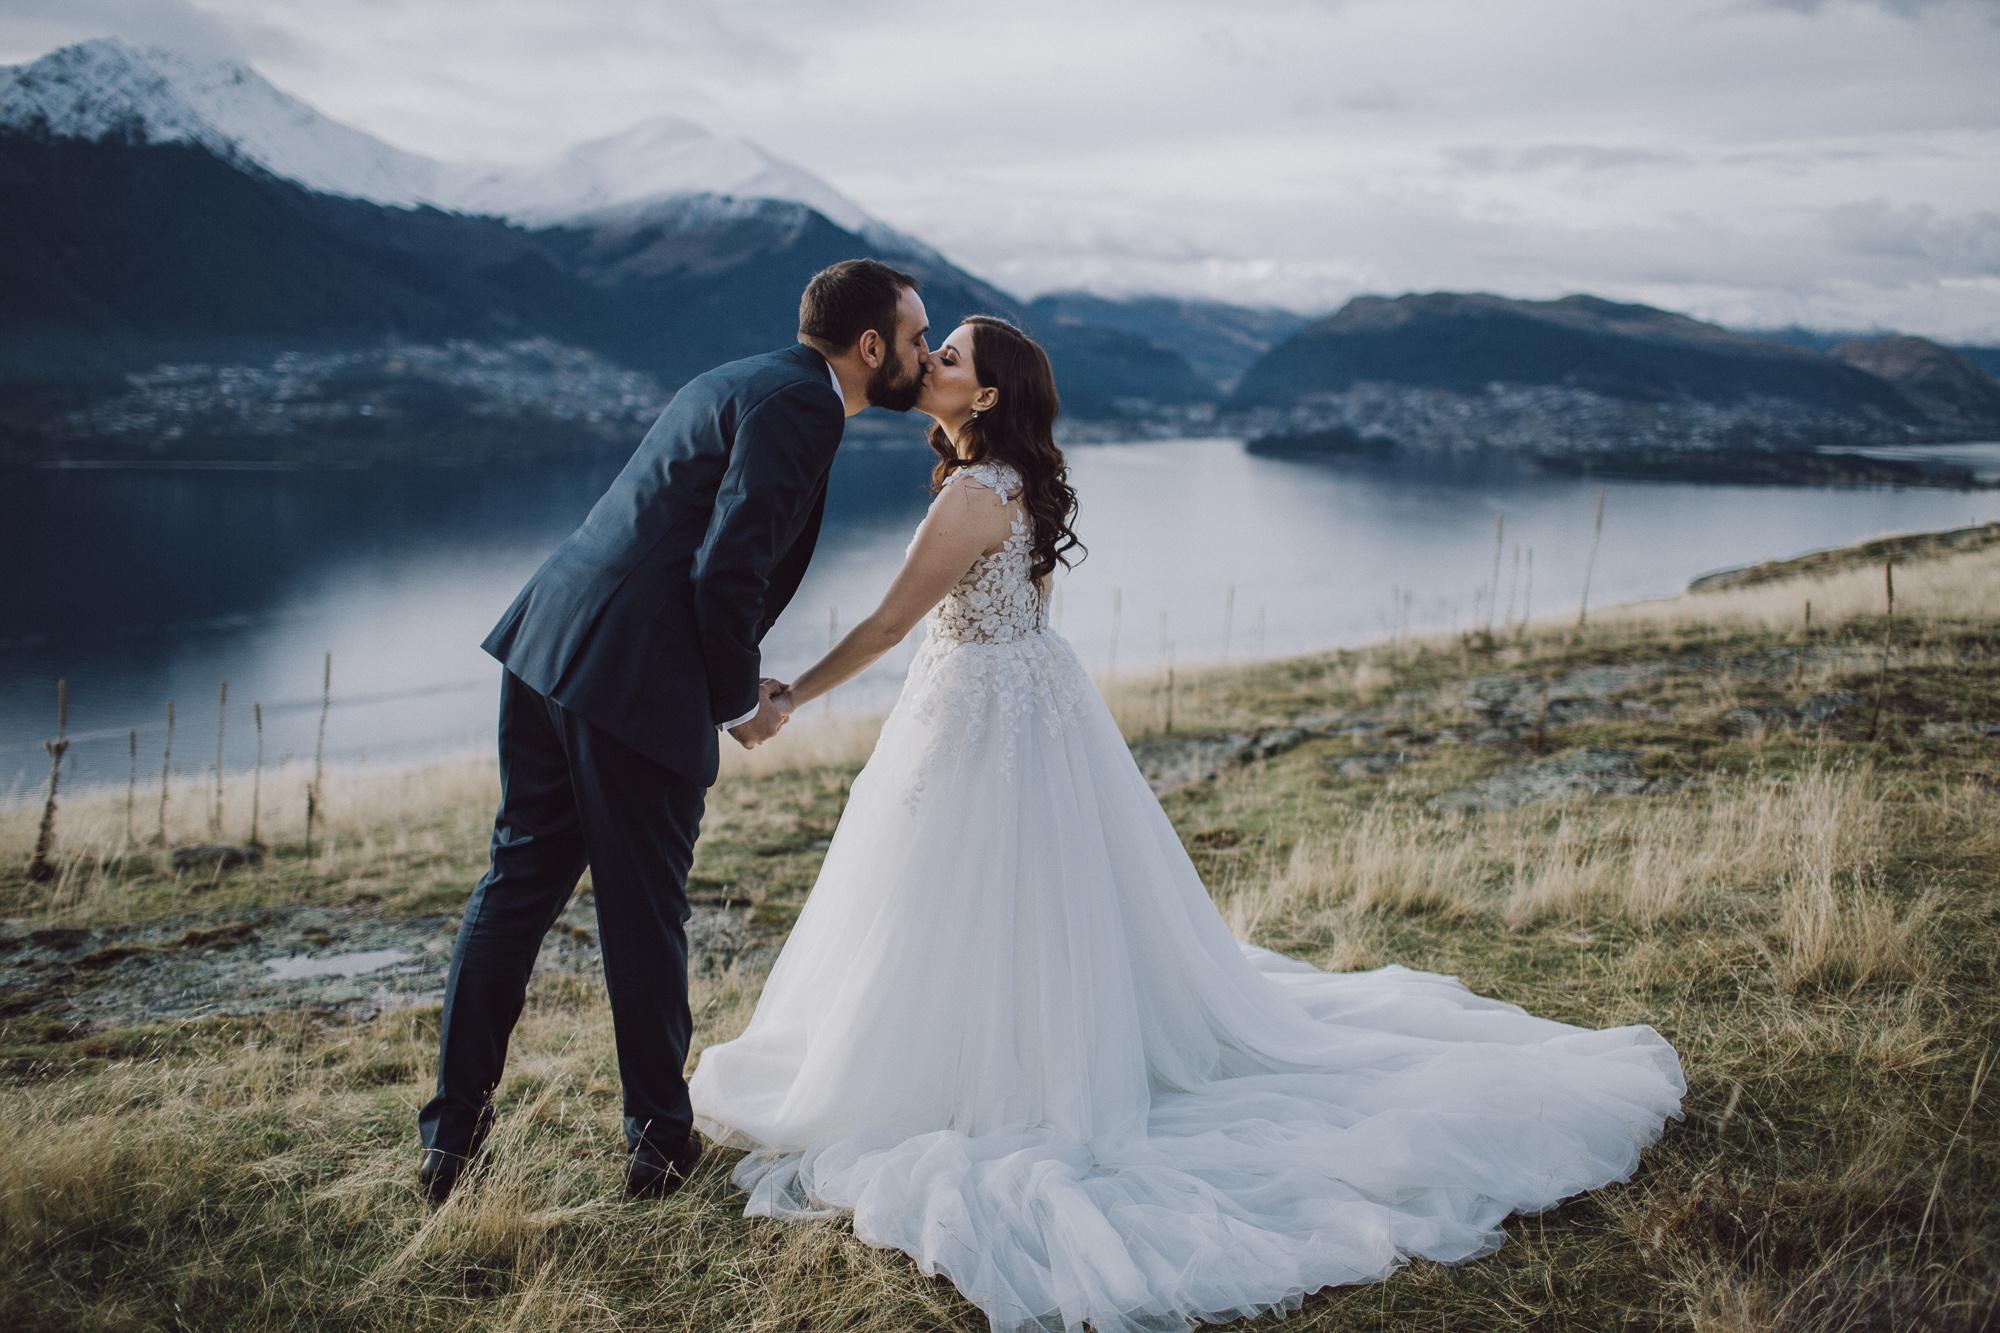 Cecil Peak mountain top photos for destination wedding